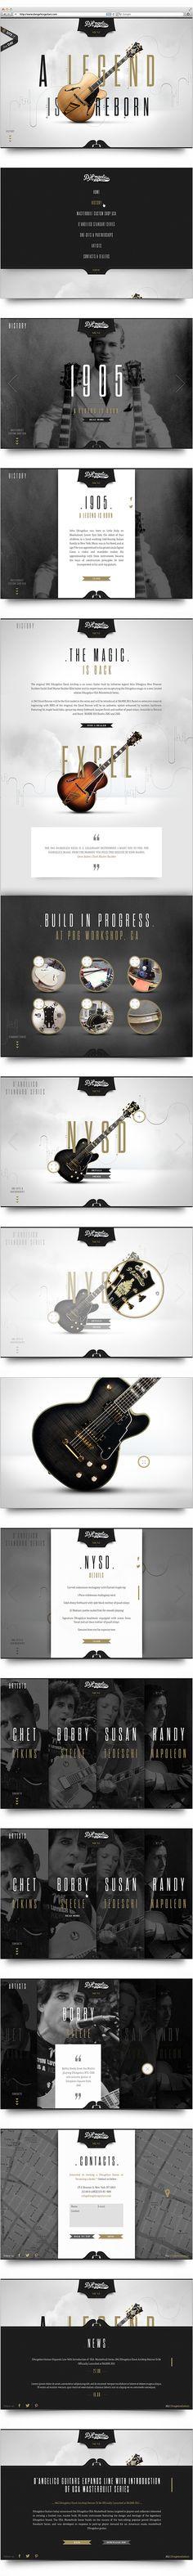 D'Angelico Guitars by Stella Petkova, via Behance